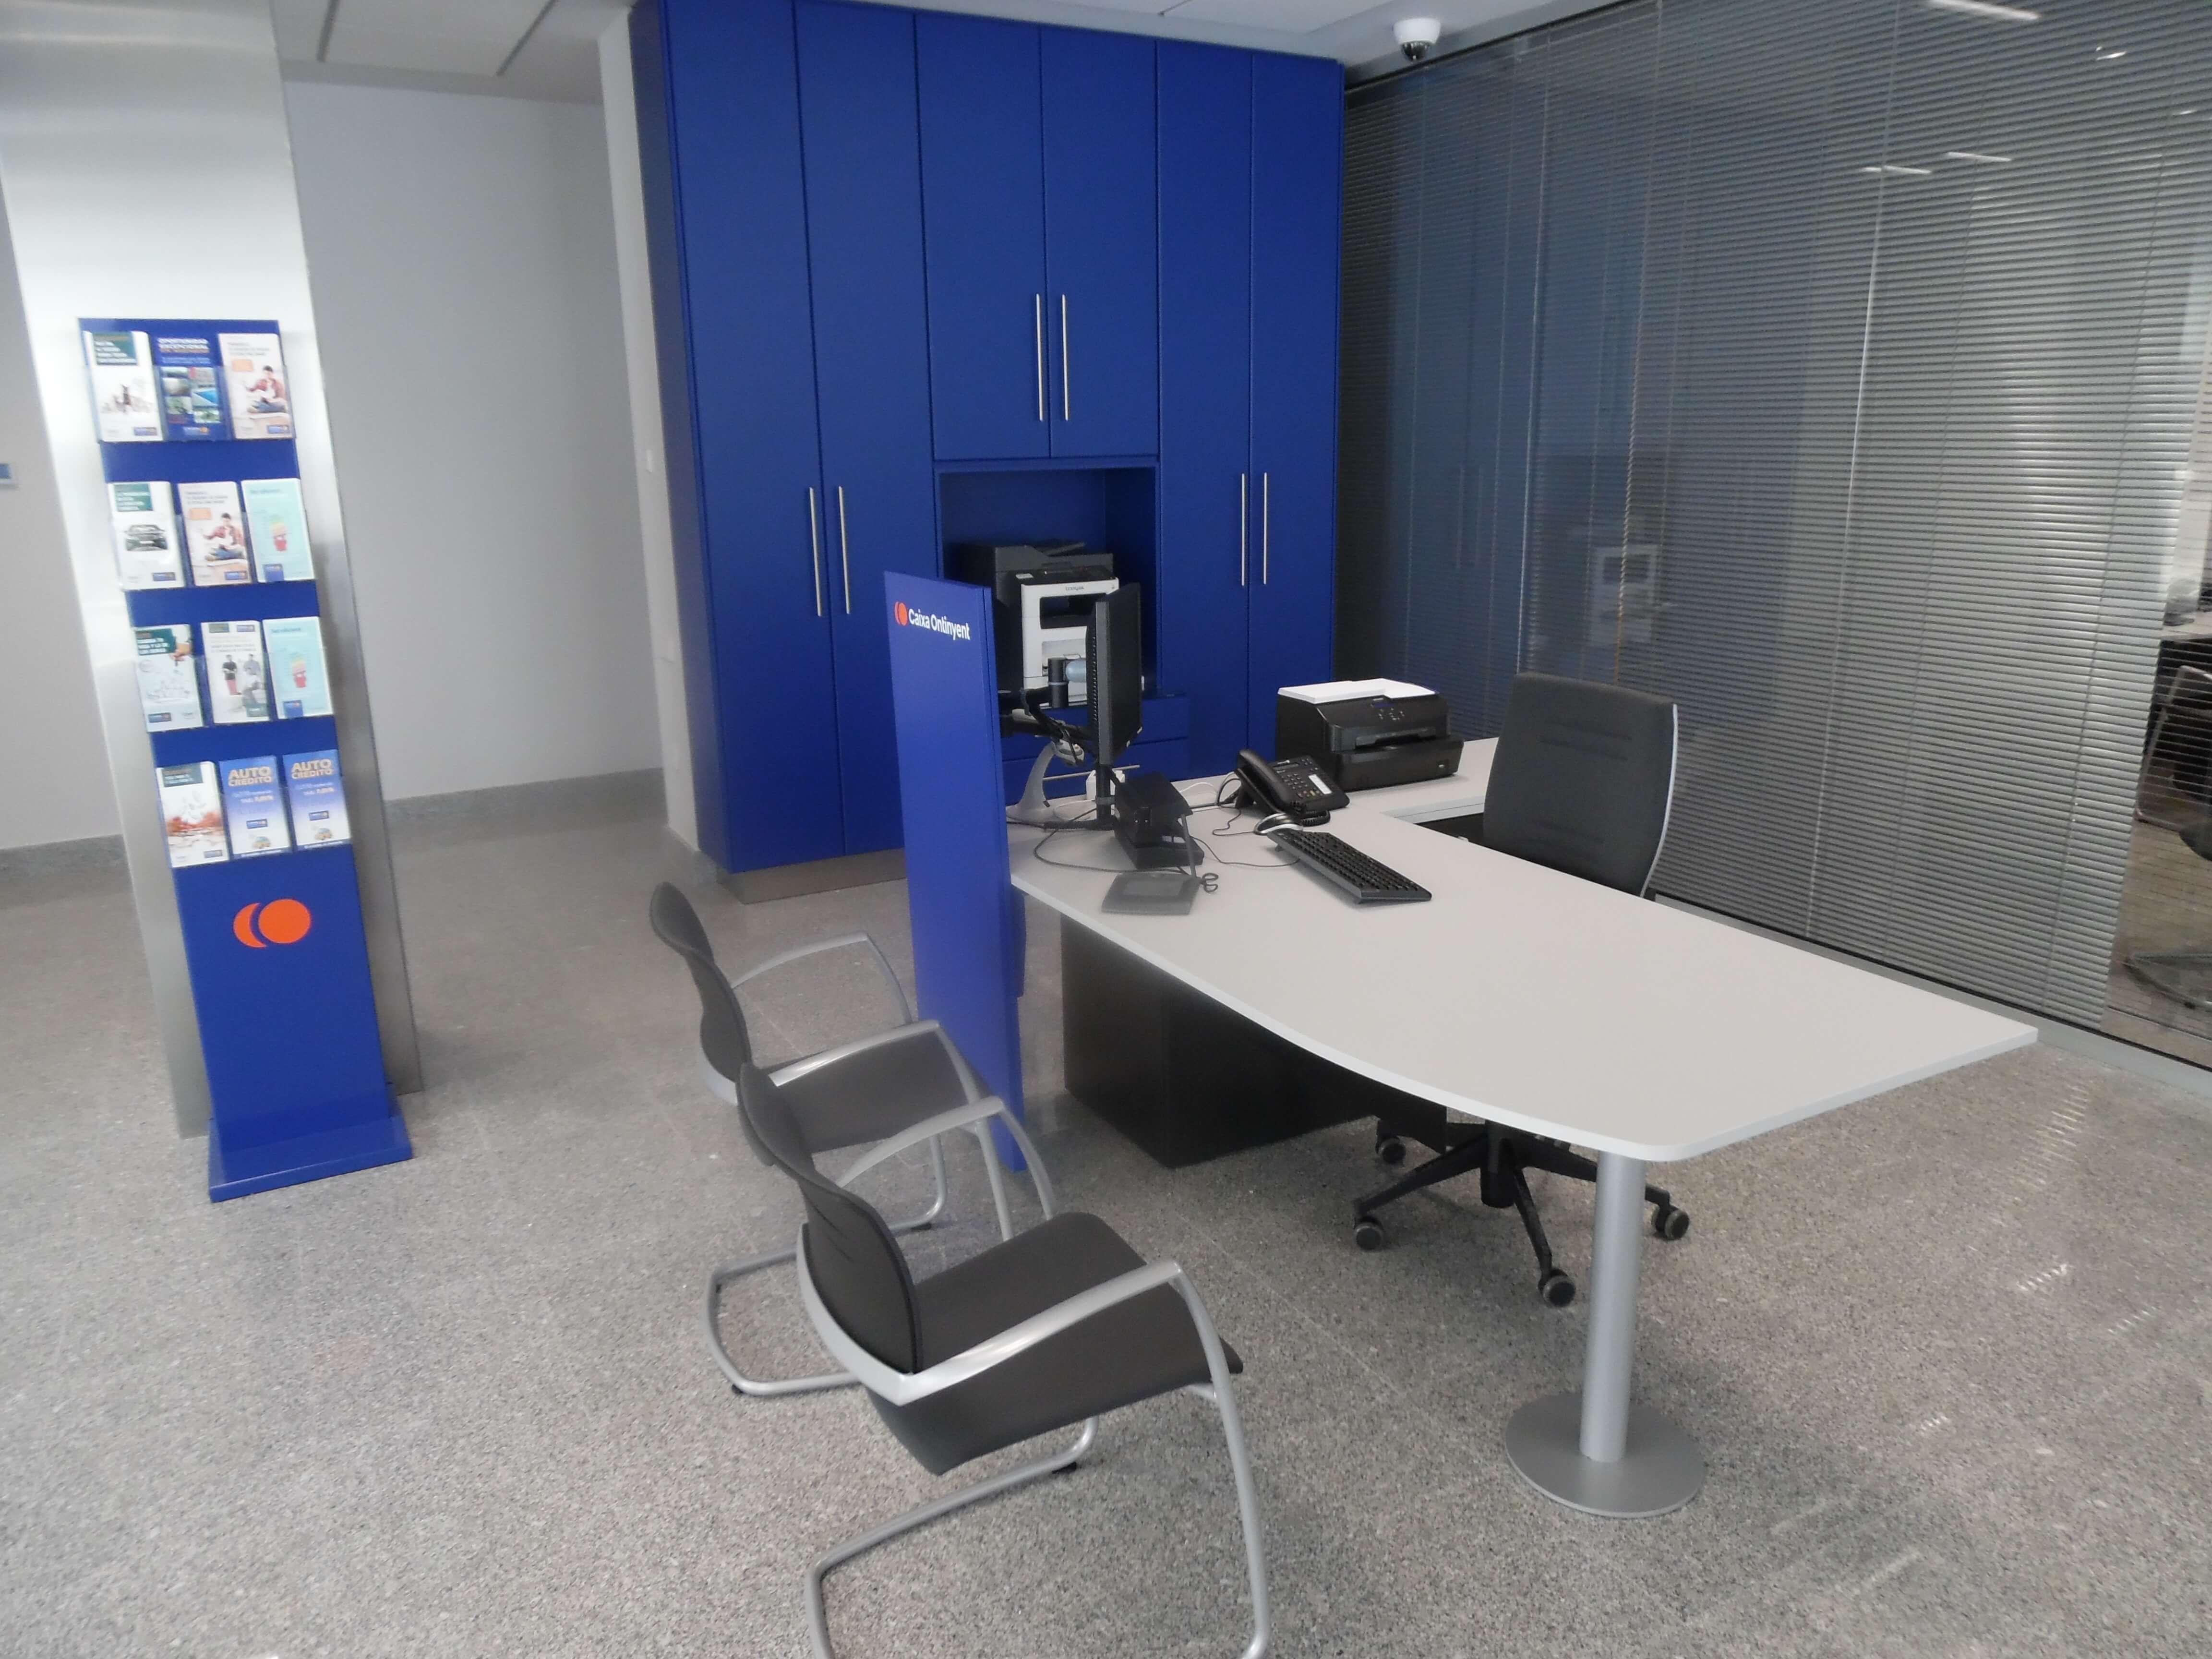 Oficina ibi caixa ontinyent inel valencia alicante for Oficinas la caixa en valencia